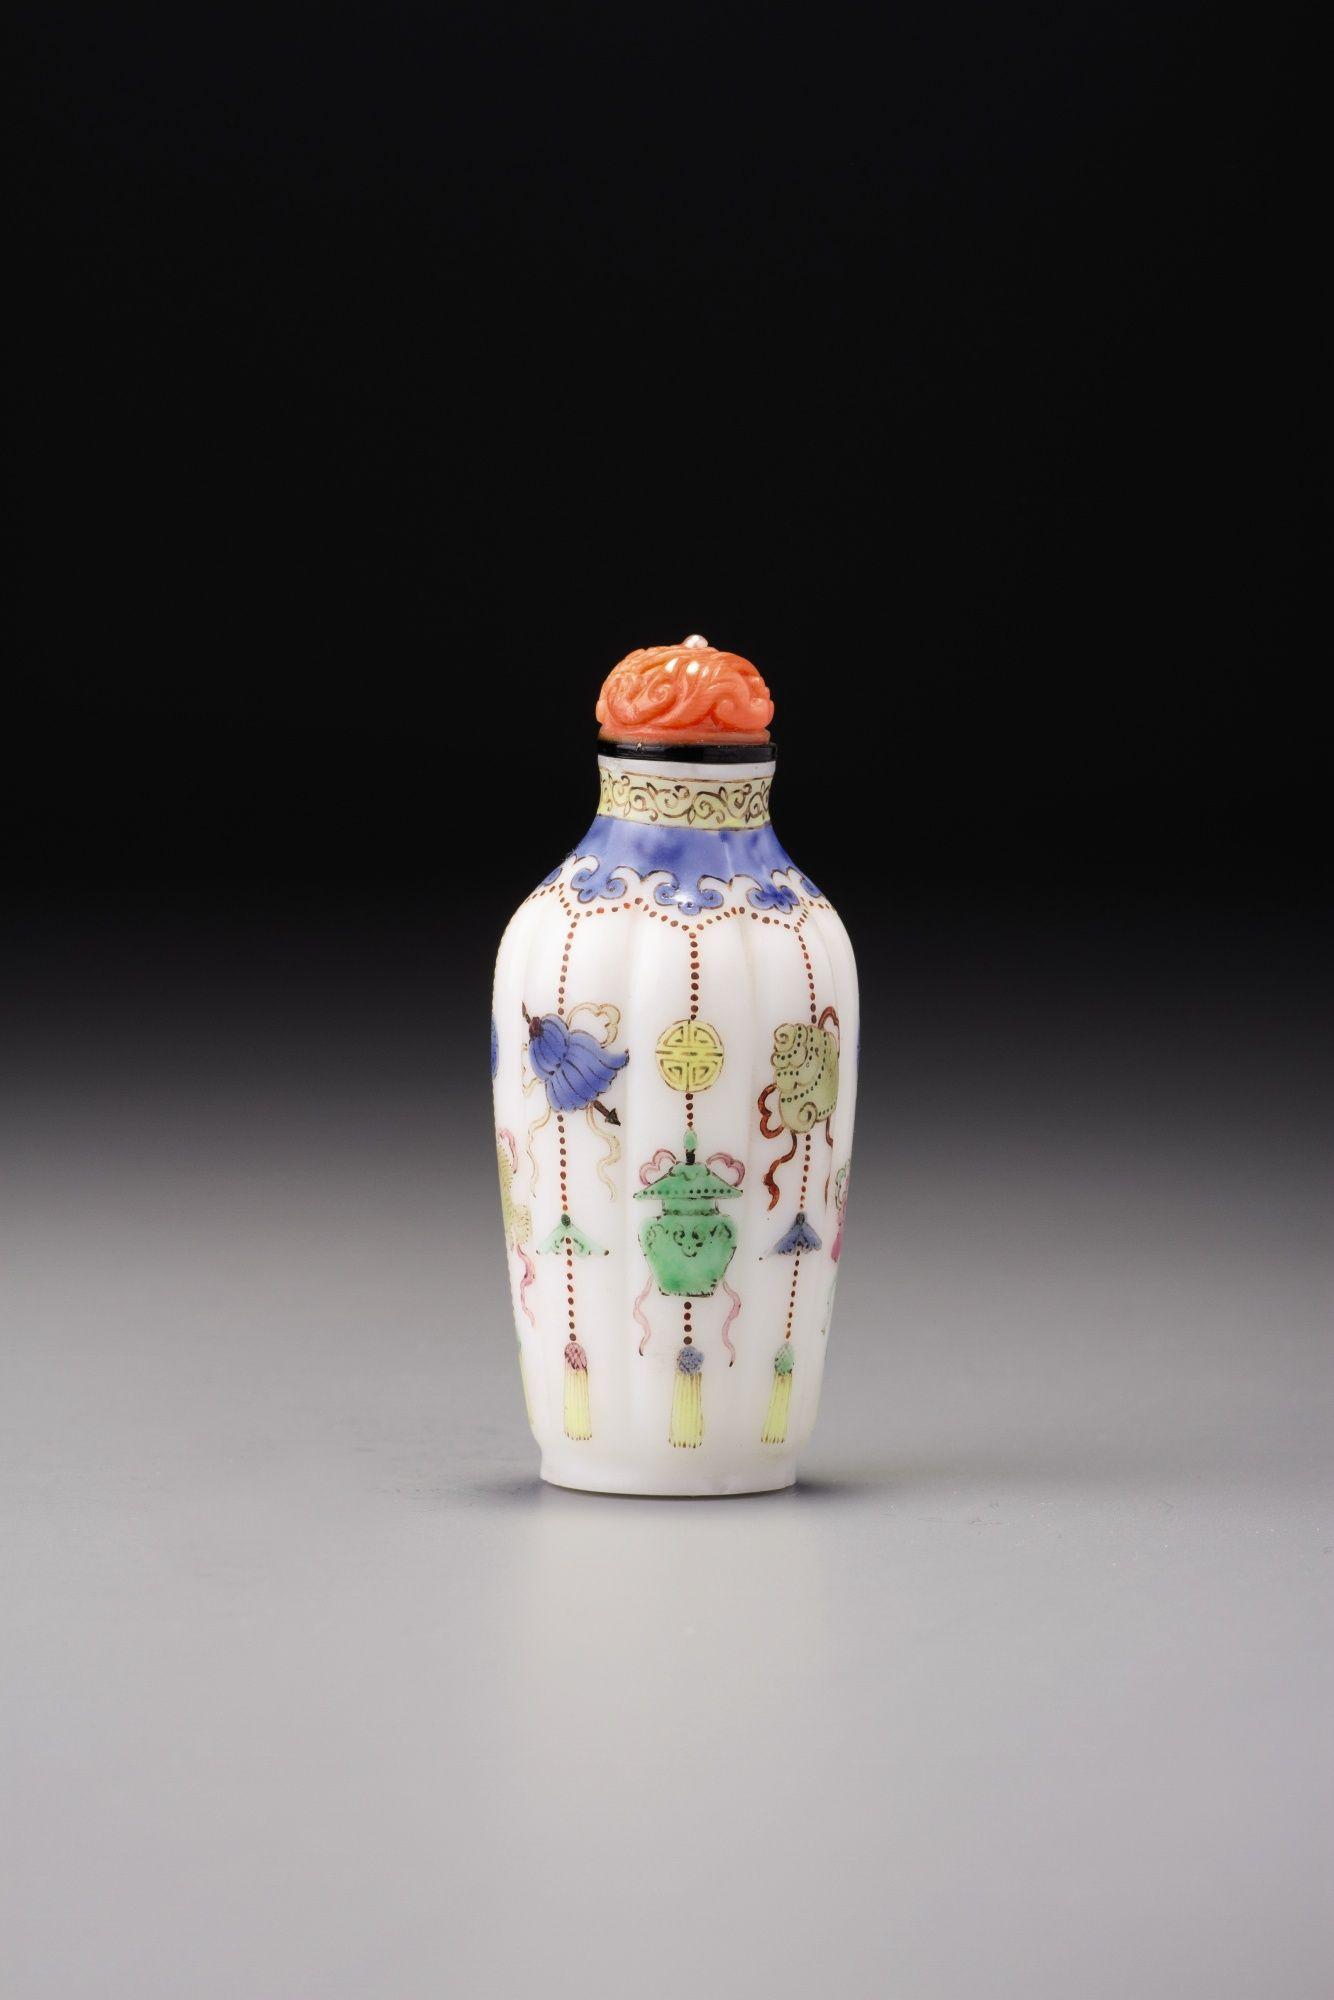 AN ENAMELLED WHITE GLASS 'EIGHT BUDDHIST EMBLEMS' SNUFF BOTTLE QING DYNASTY, QIANLONG PERIOD